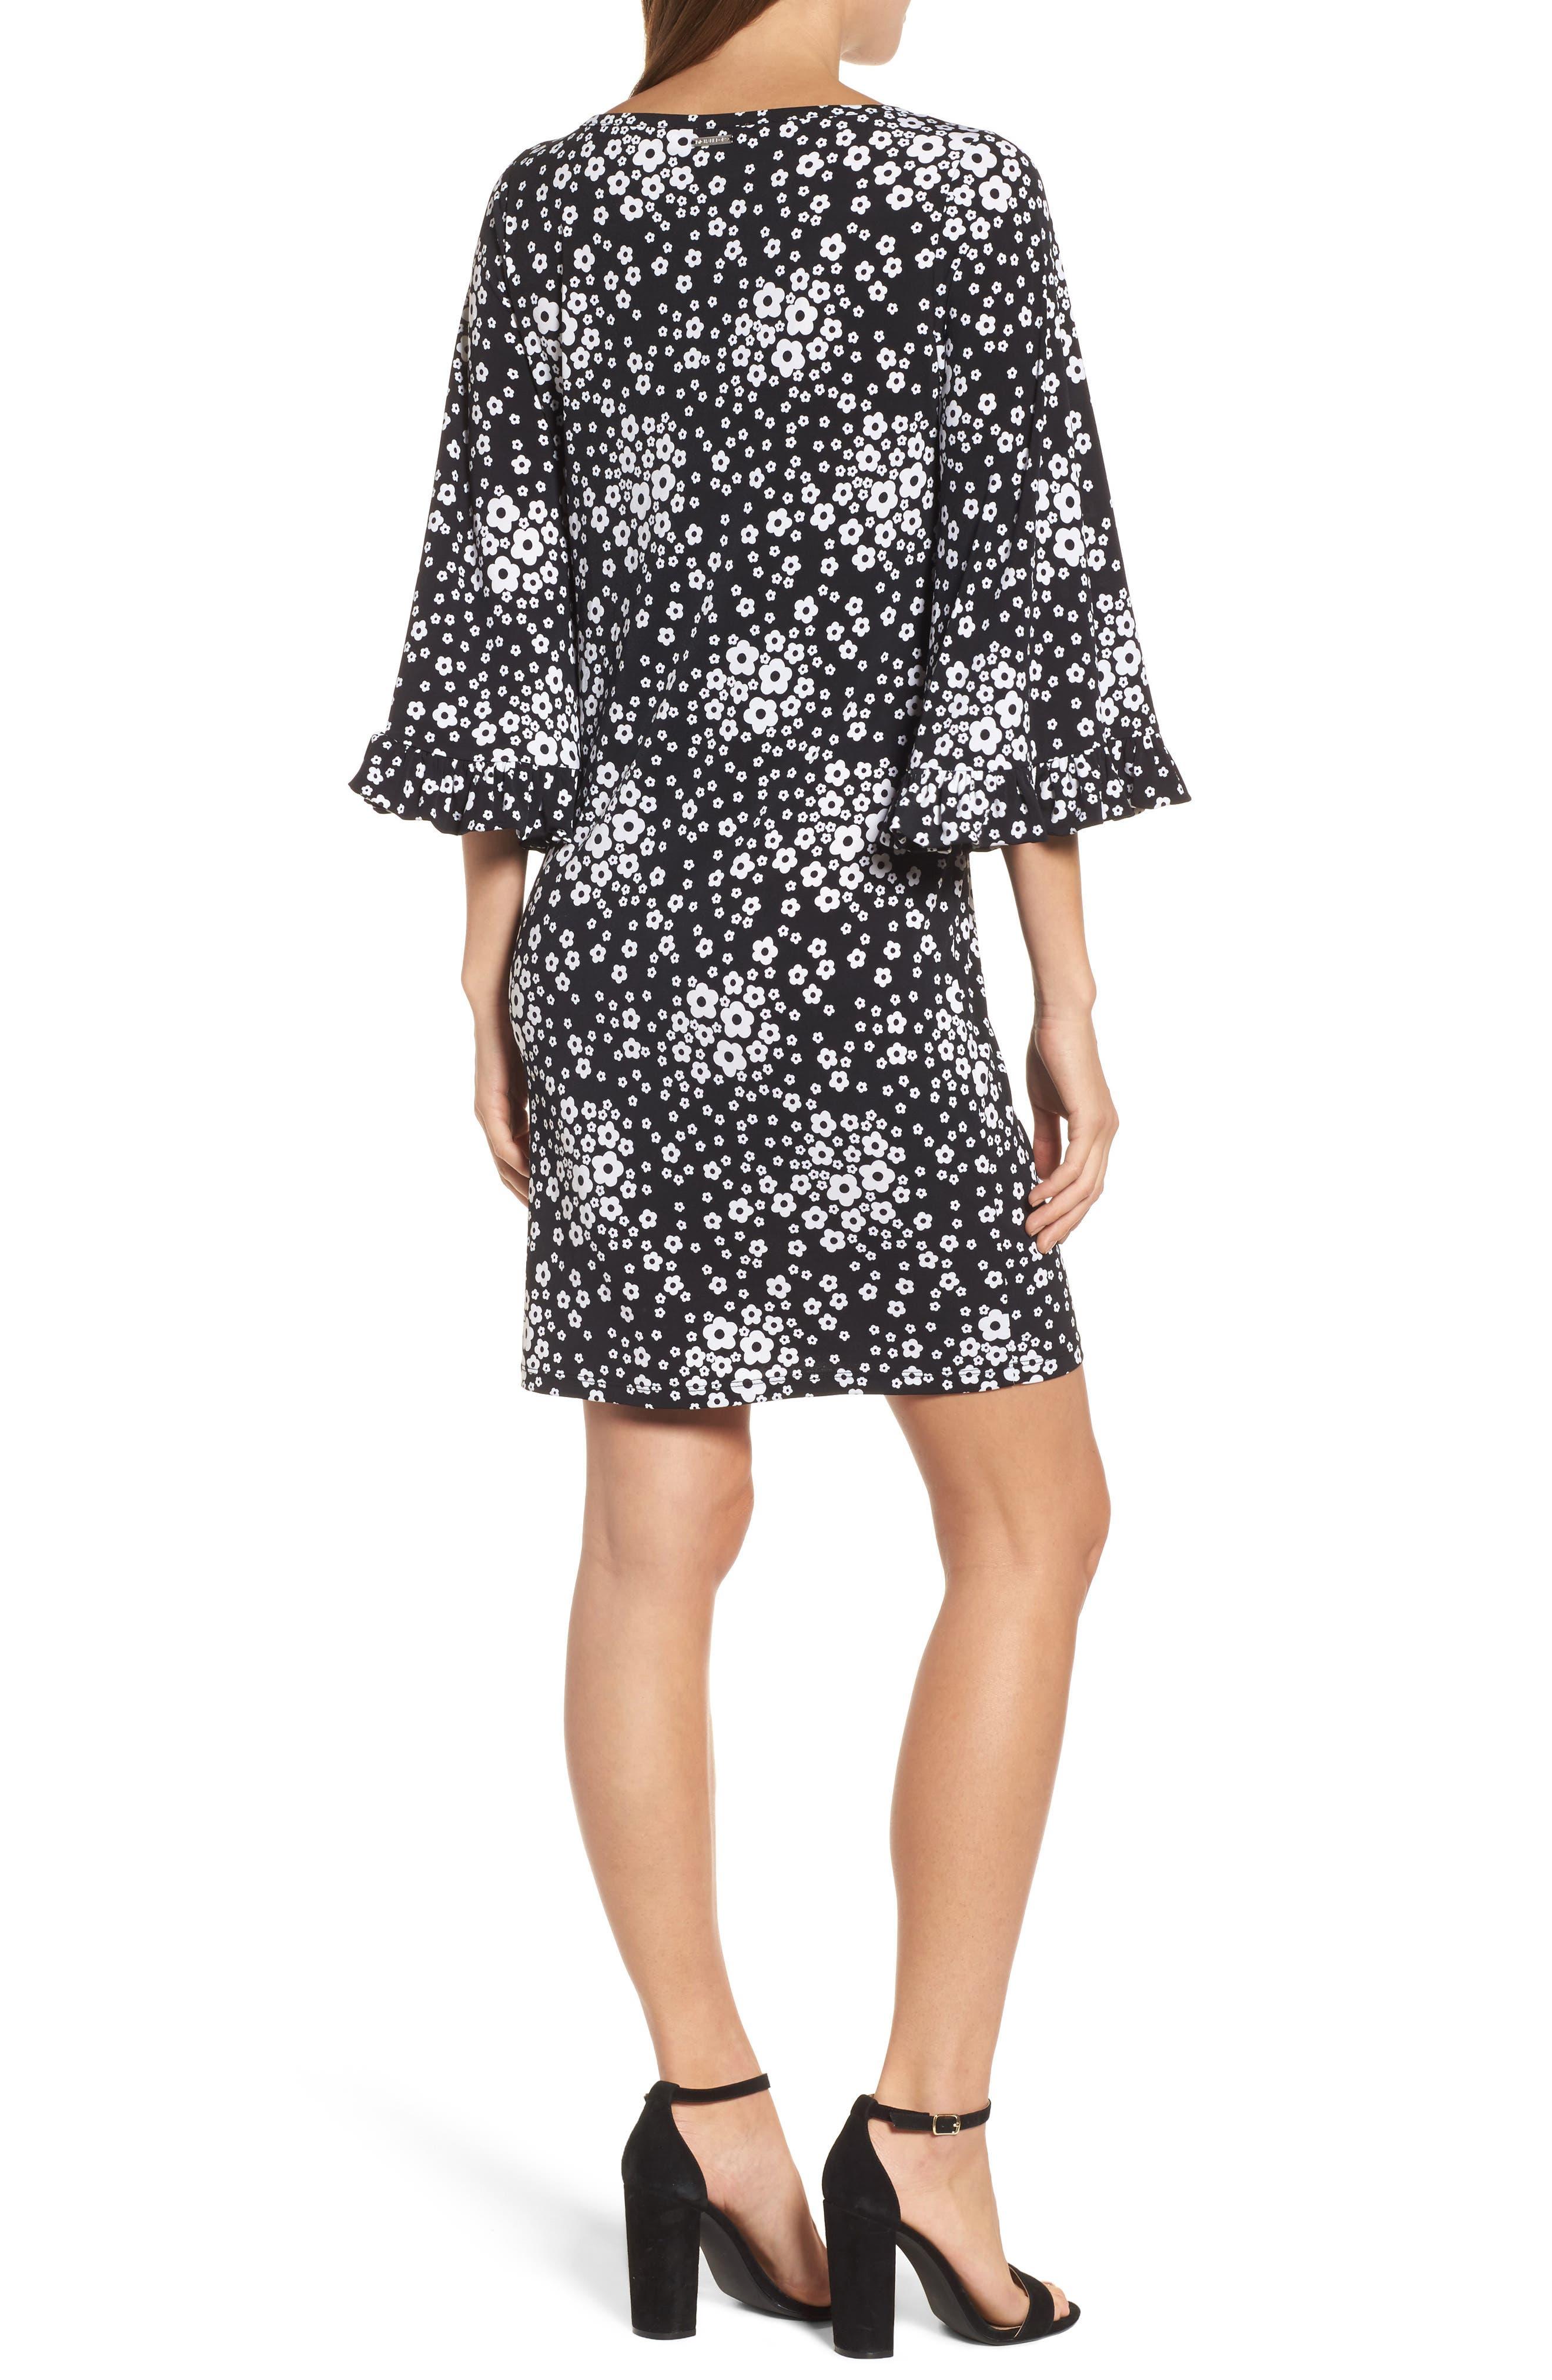 Floral Mod Shift Dress,                             Alternate thumbnail 2, color,                             Black/ White